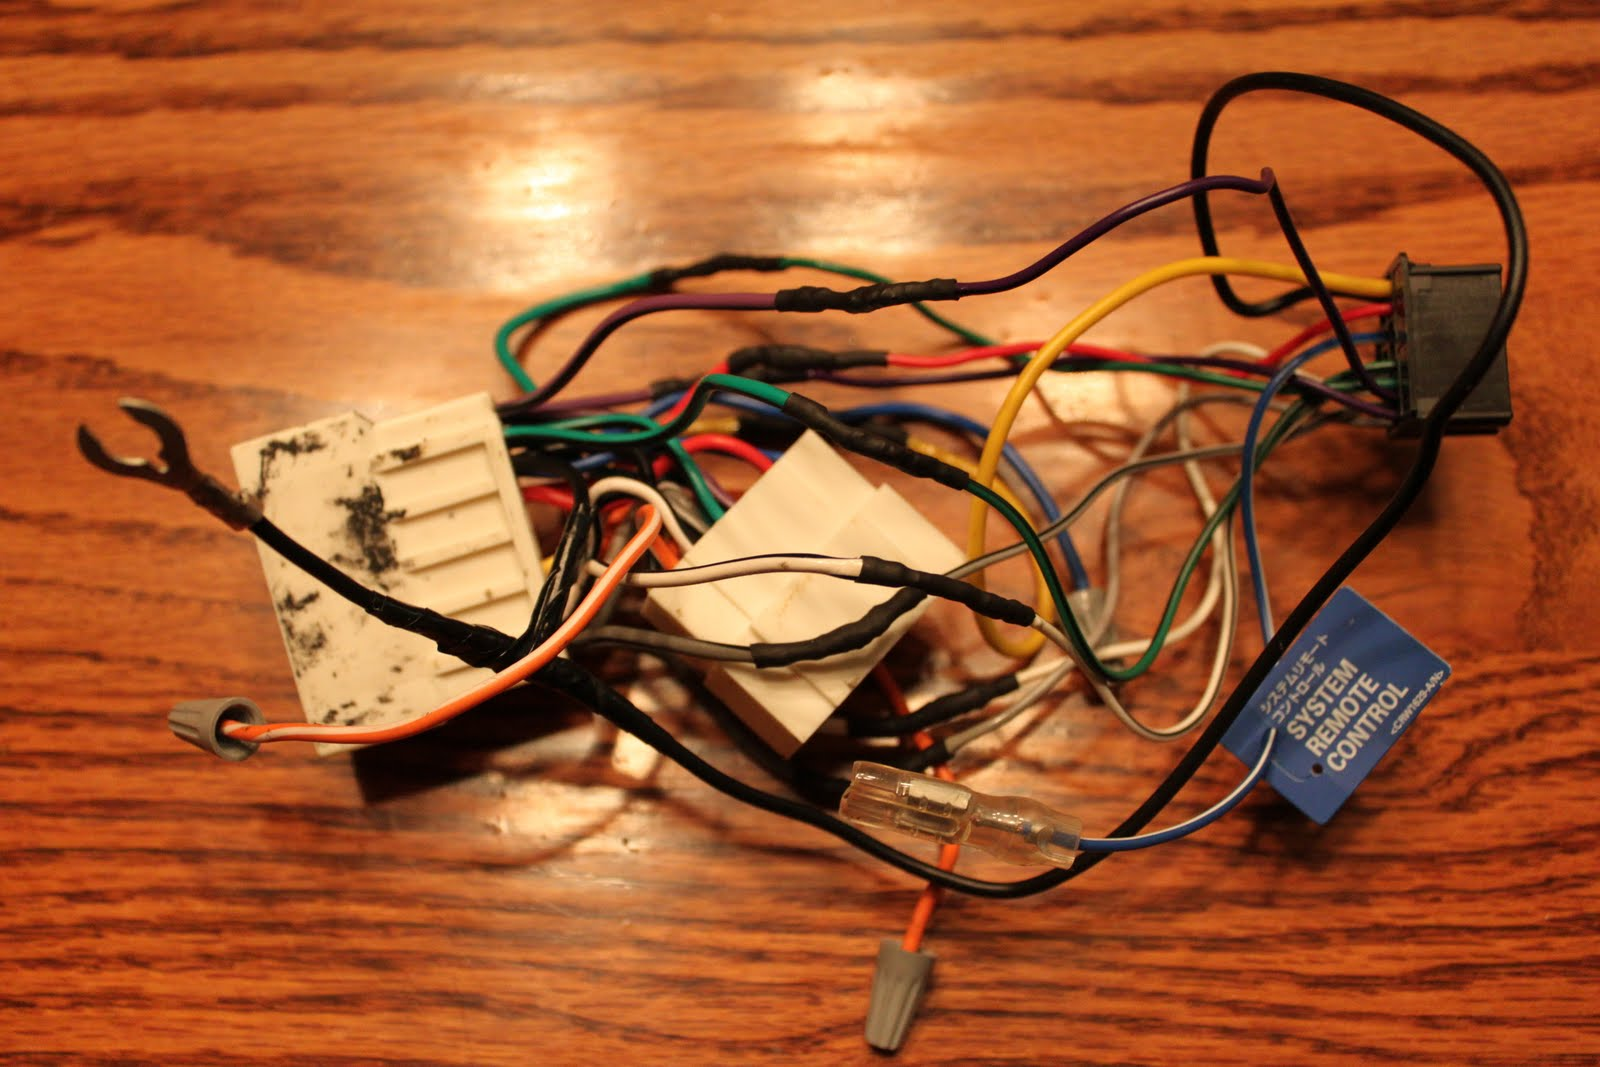 car radio wiring harness solder youtube car wiring harness kits bryan s blog soldering car stereo harness [ 1600 x 1067 Pixel ]